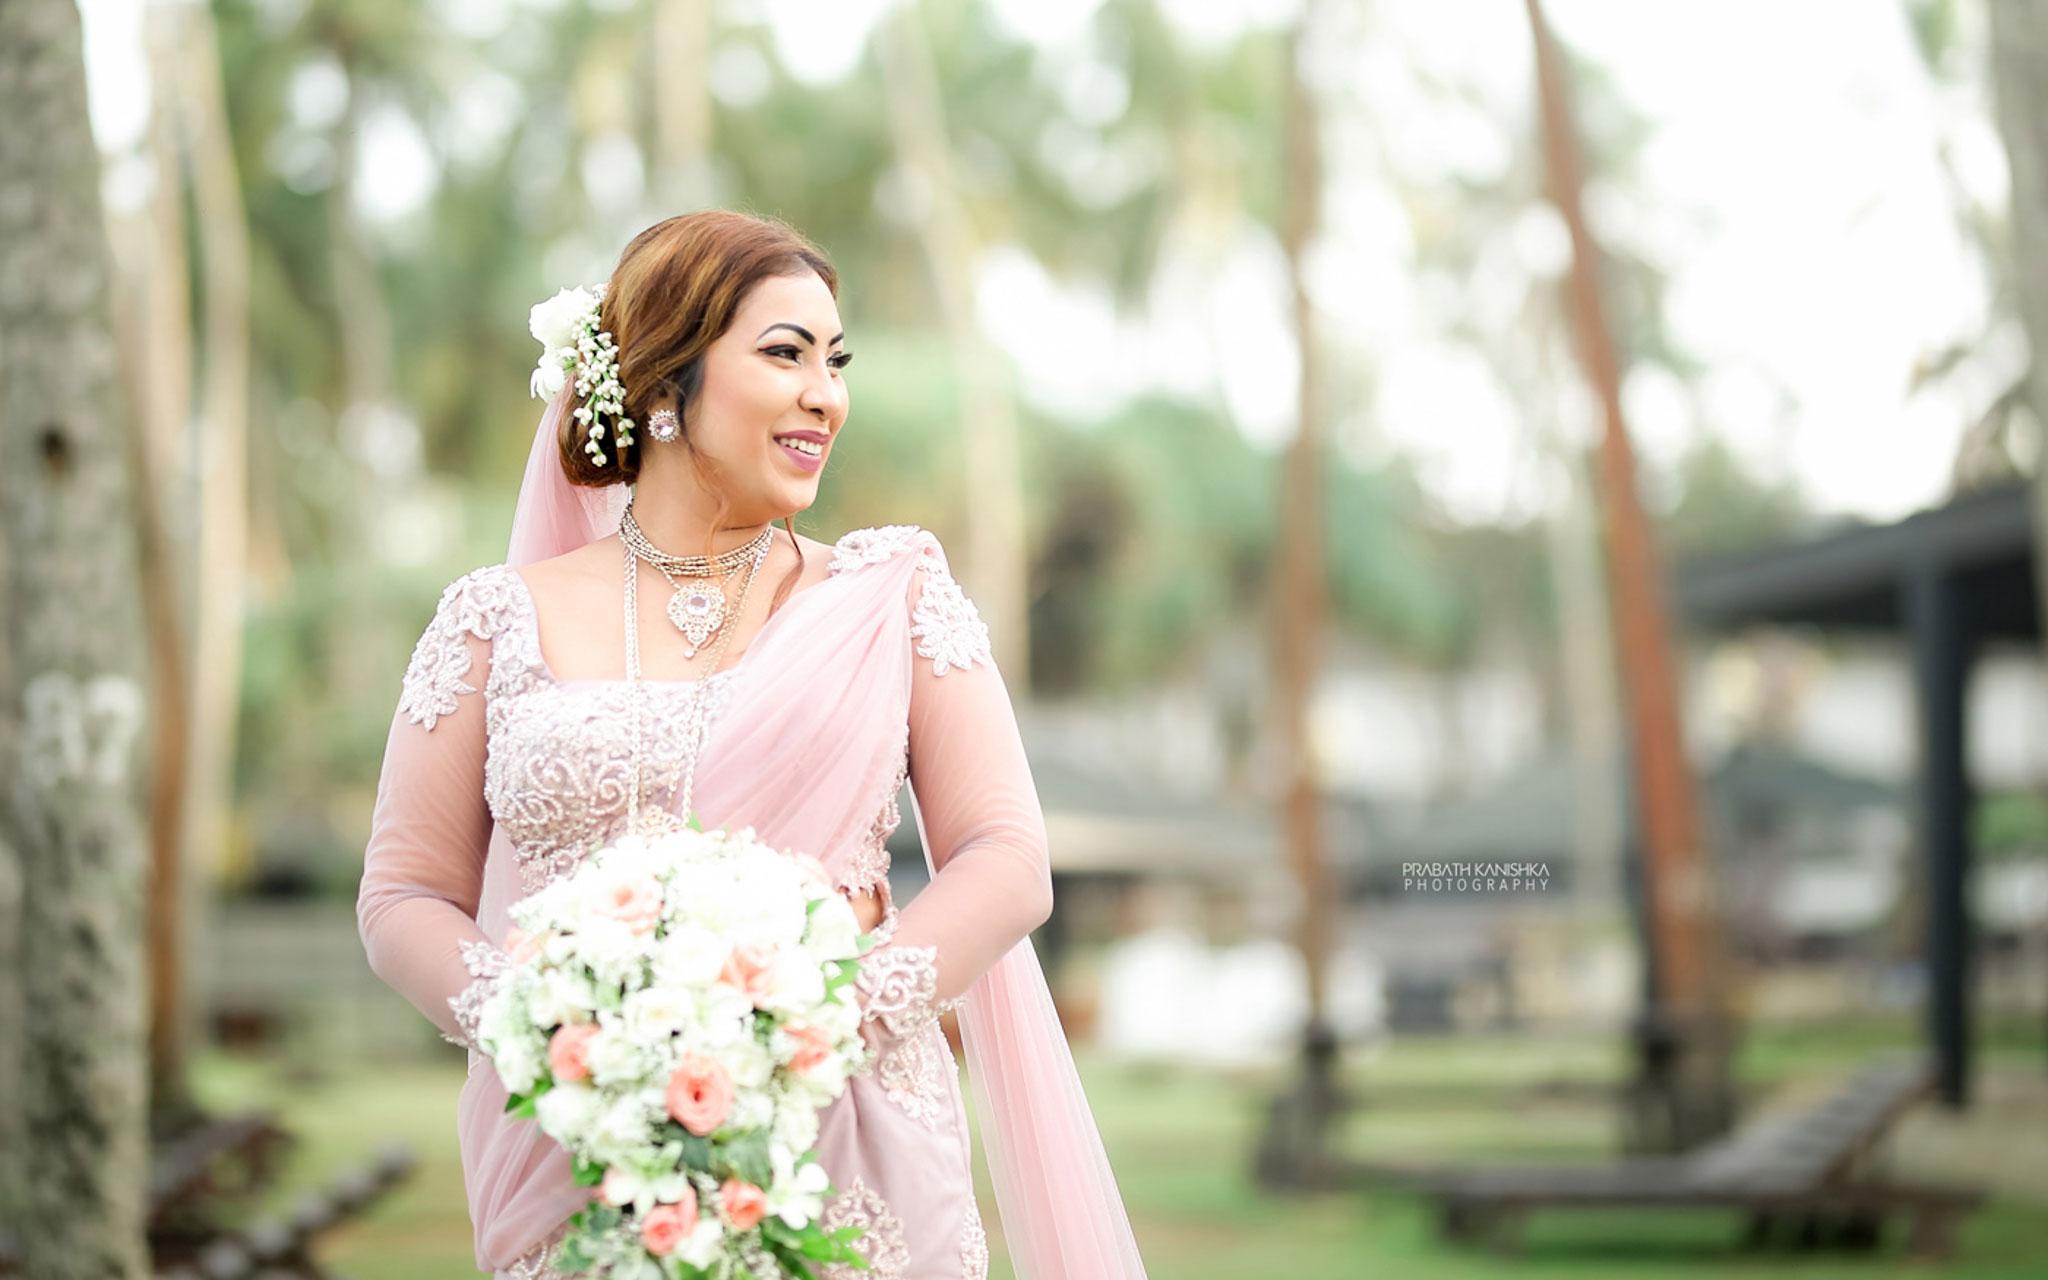 Jayani & Savishka - Prabath Kanishka Wedding Photography